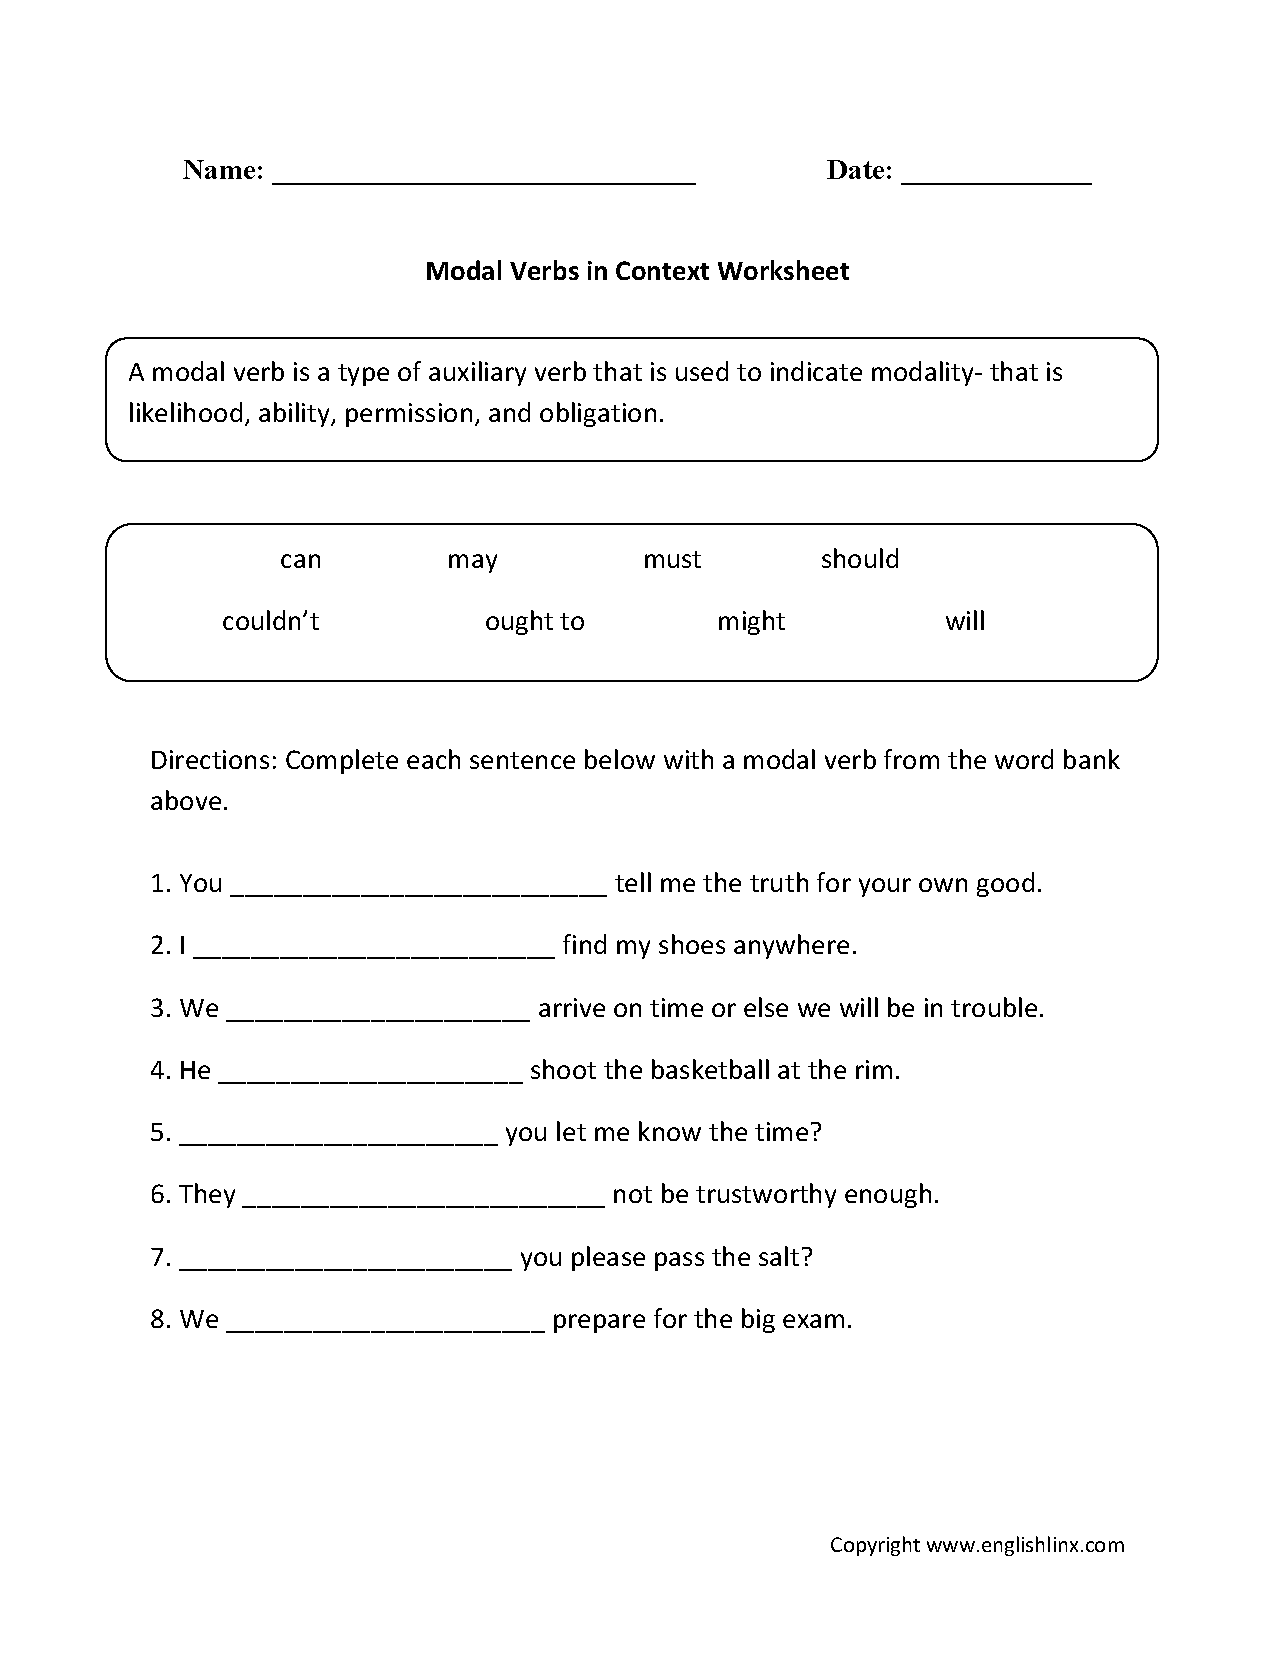 Modal Verbs Worksheets | Englishlinx.com Board | Pinterest ...